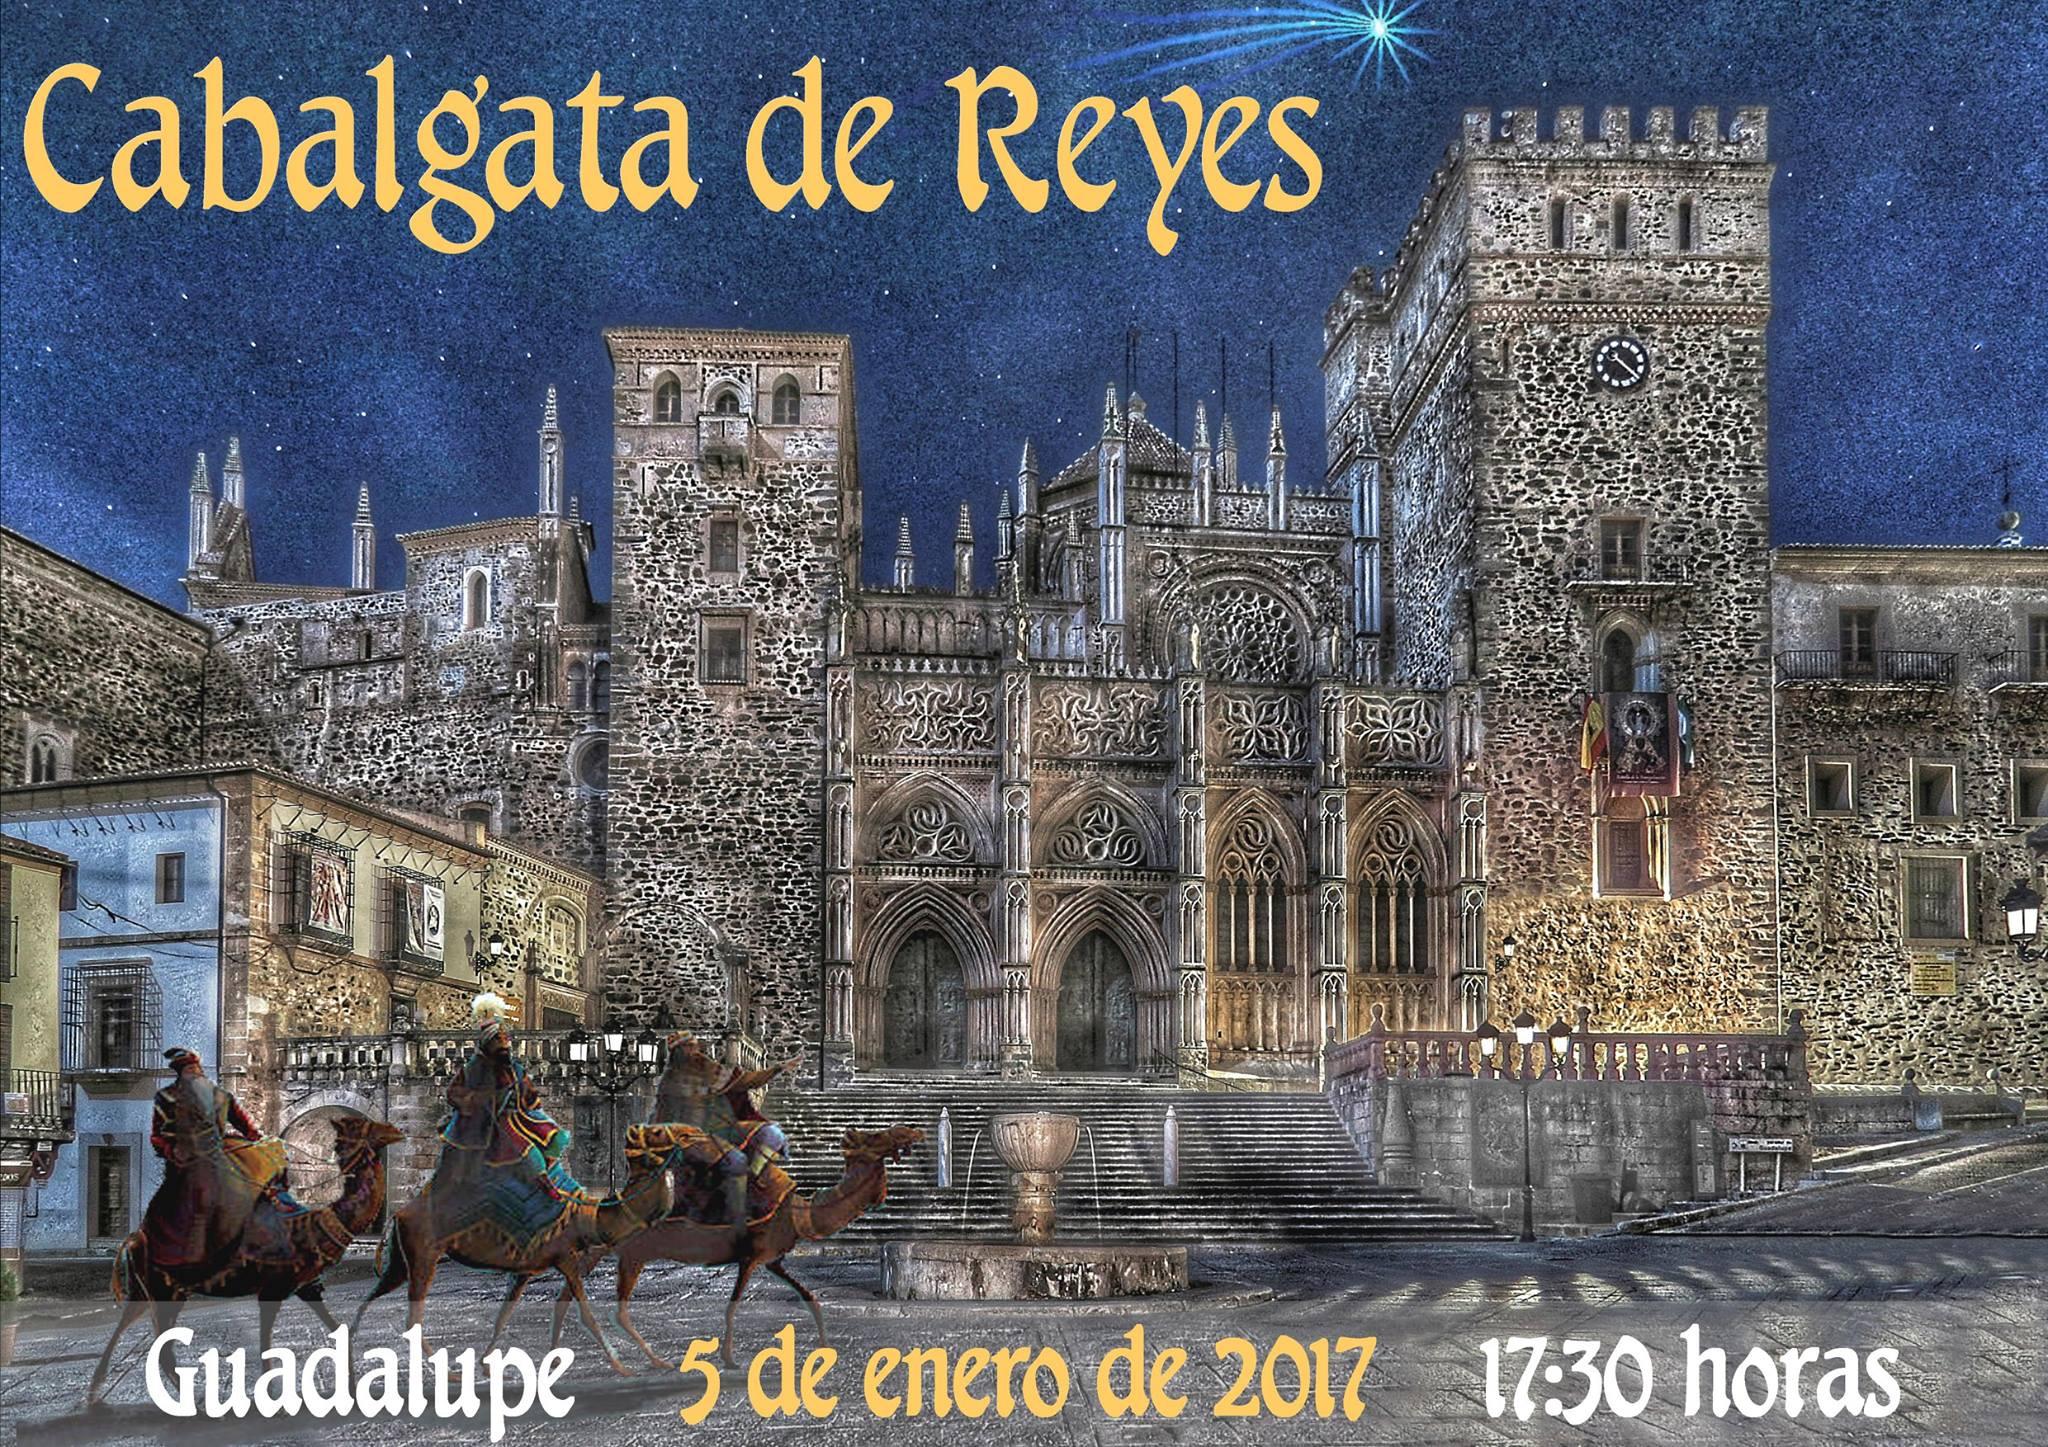 Cabalgata de Reyes 2017 - Guadalupe